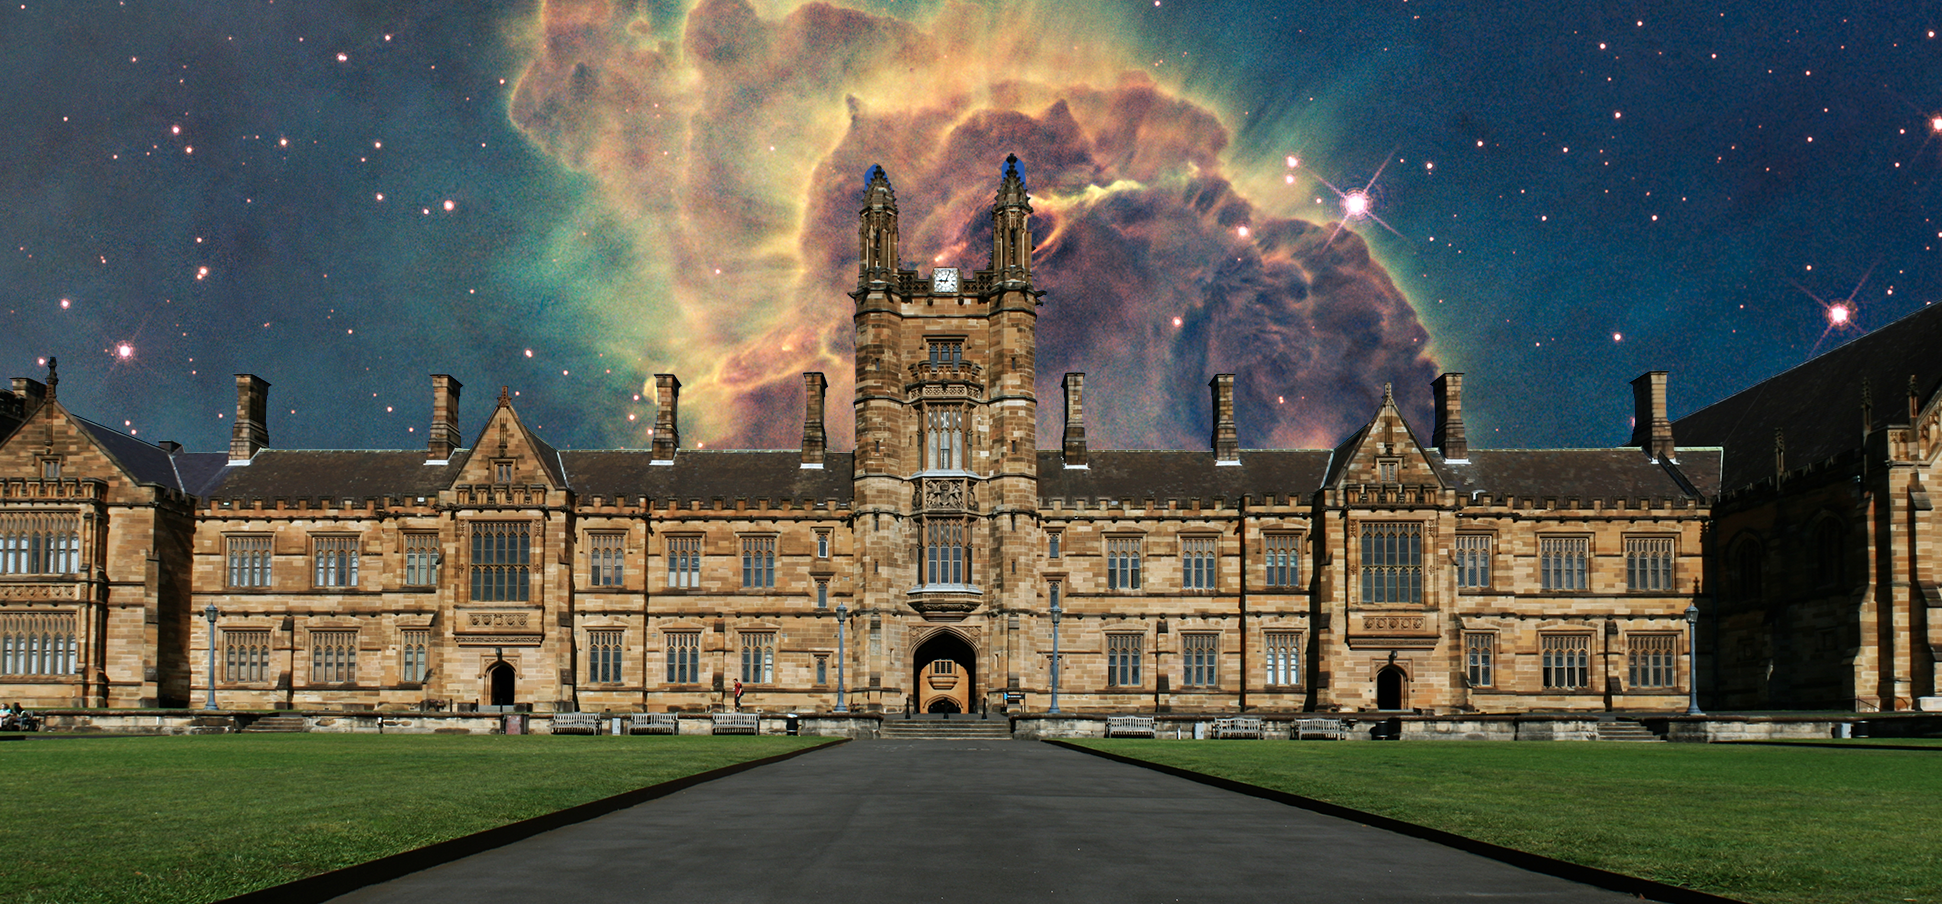 Physics aim university sydney